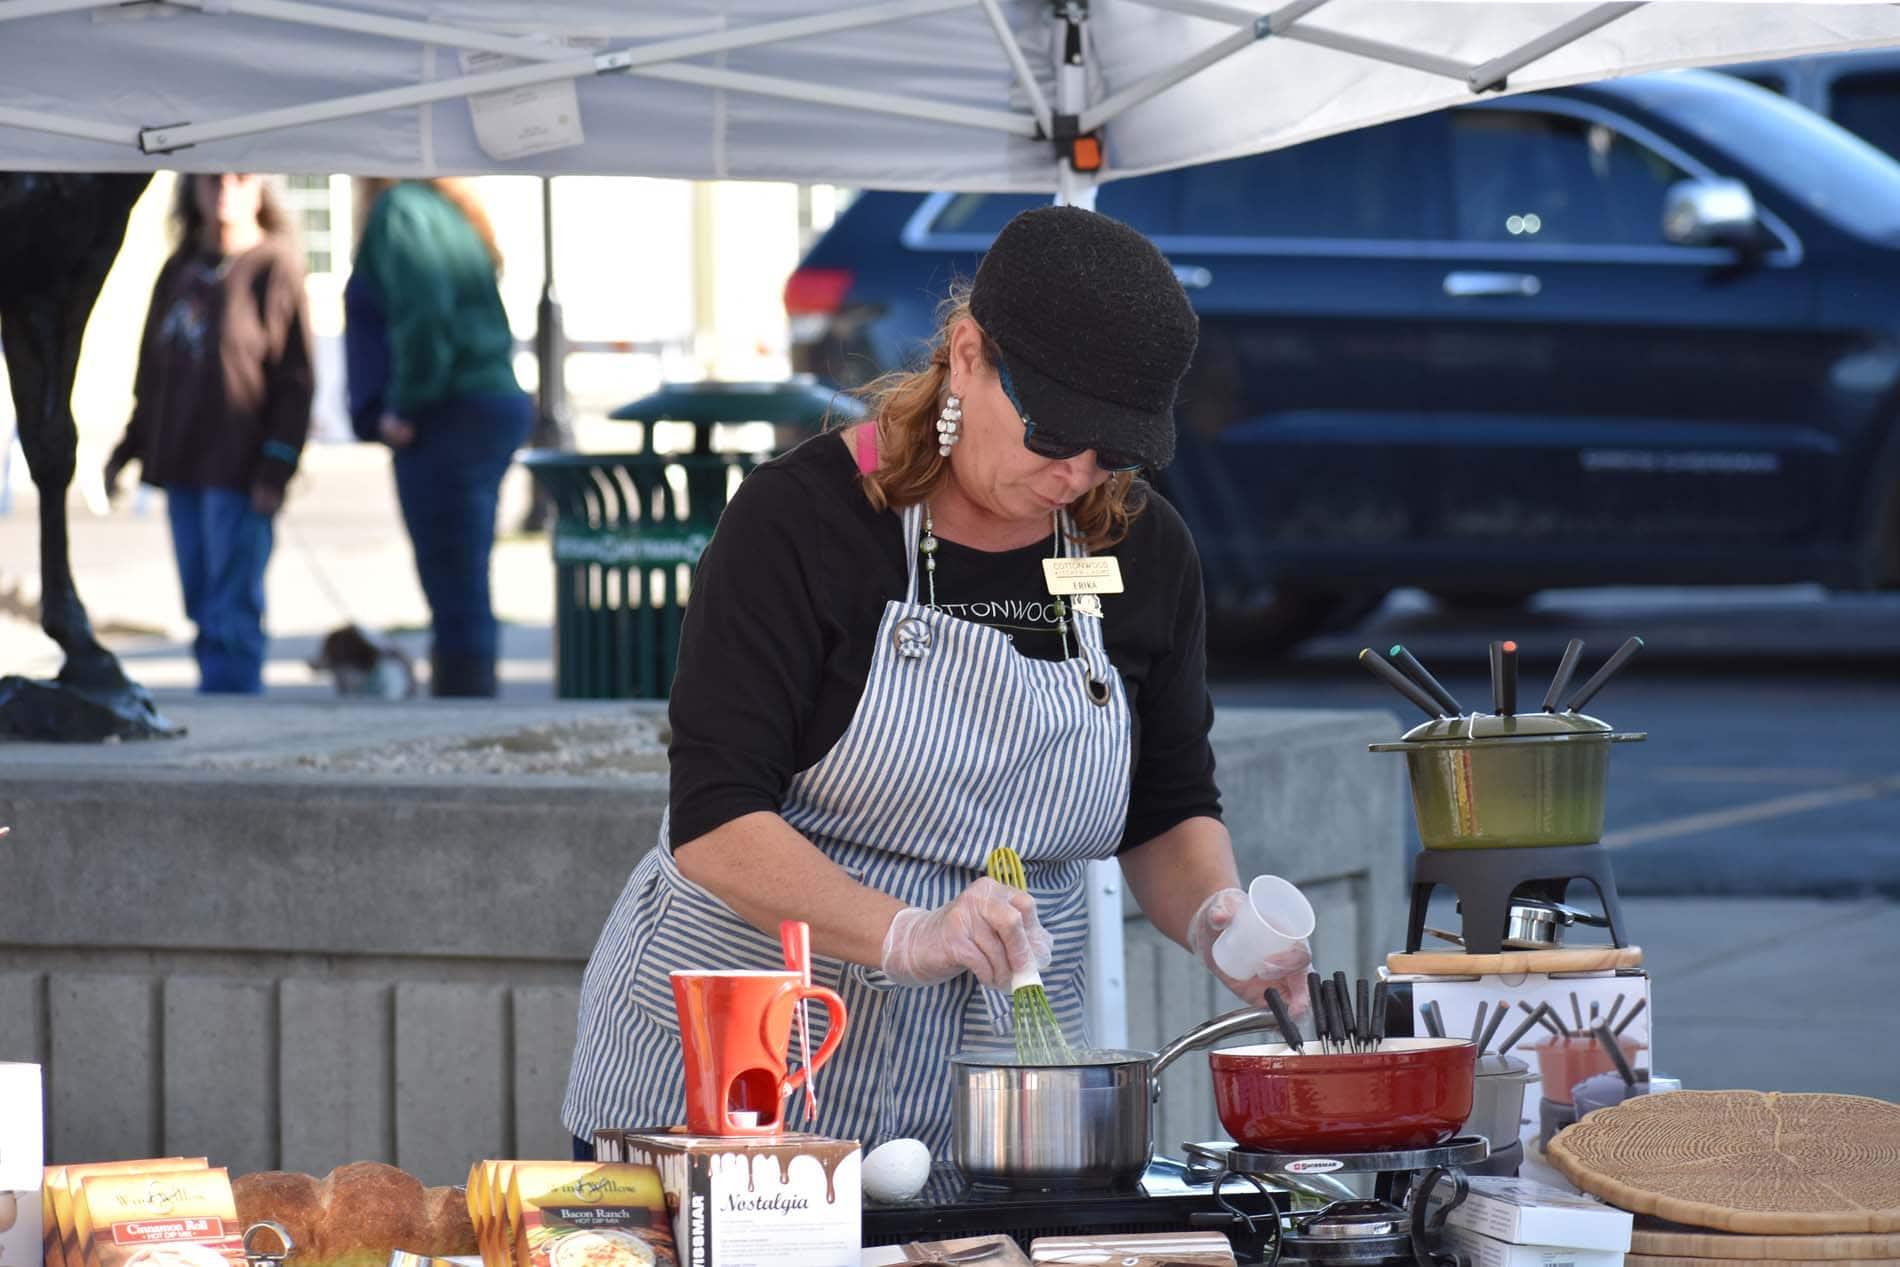 Photo of woman conducting cooking demonstration at Sheridan Farmers Market